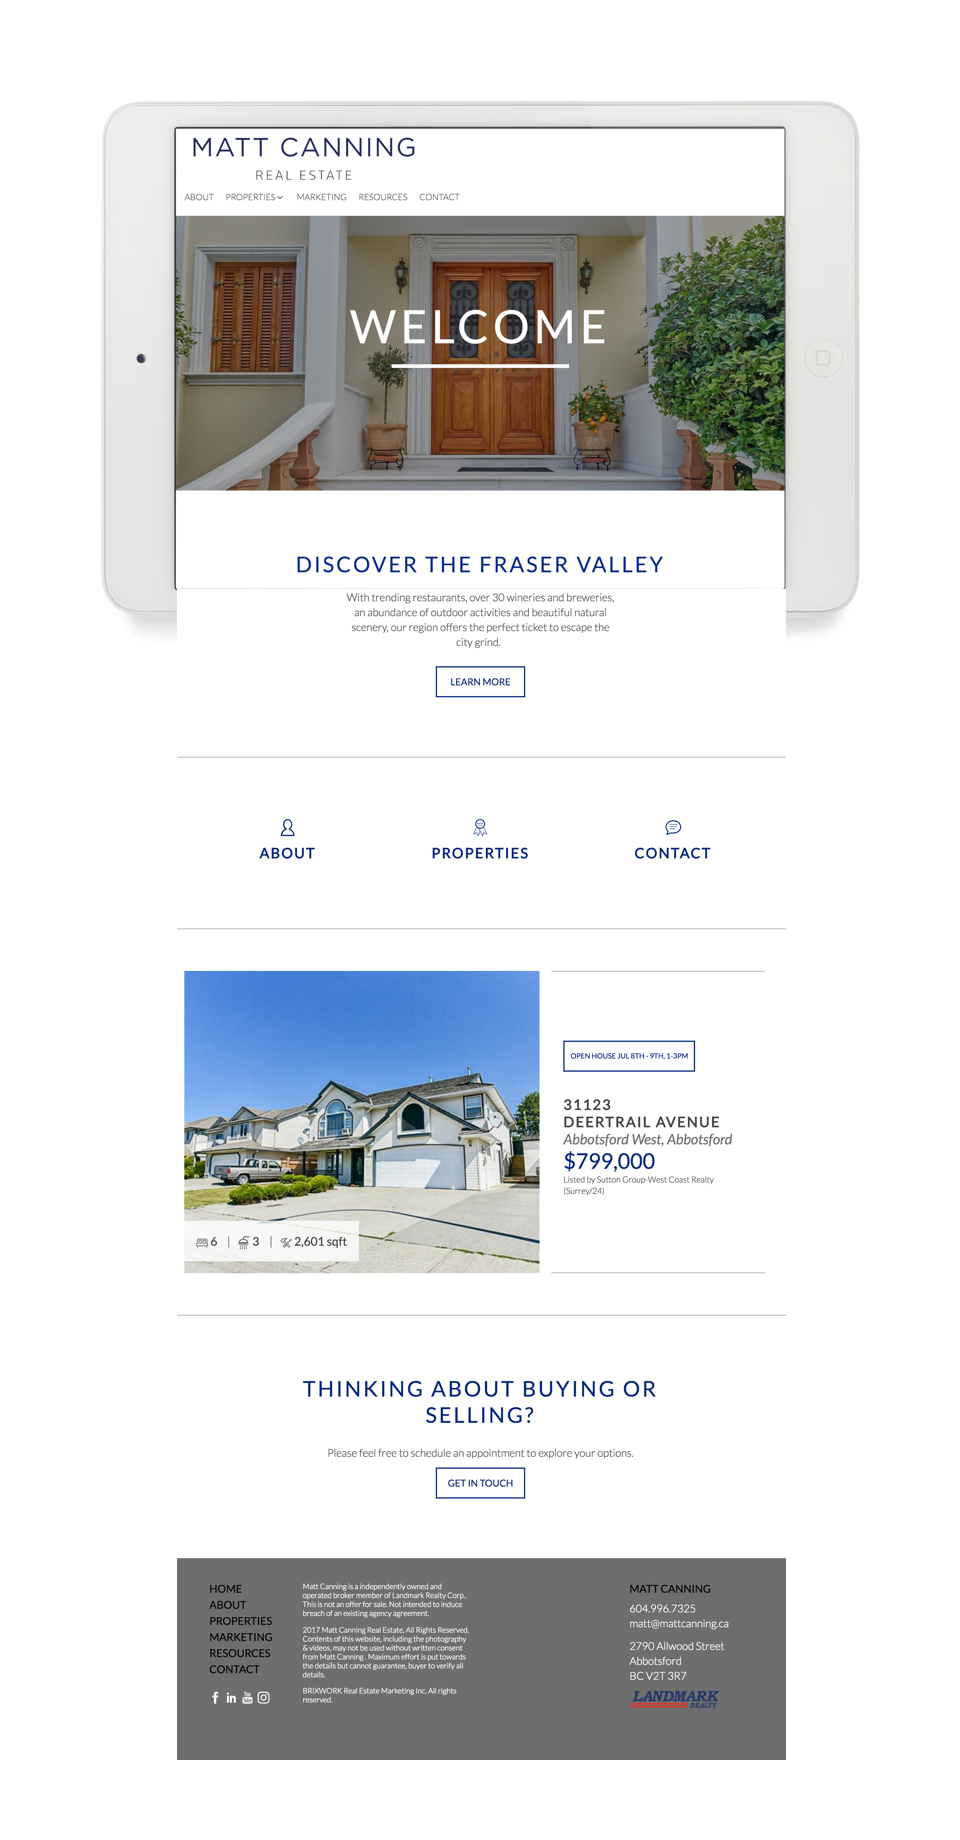 Real estate marketing website design tablet view for Matt Canning, Fraser Valley